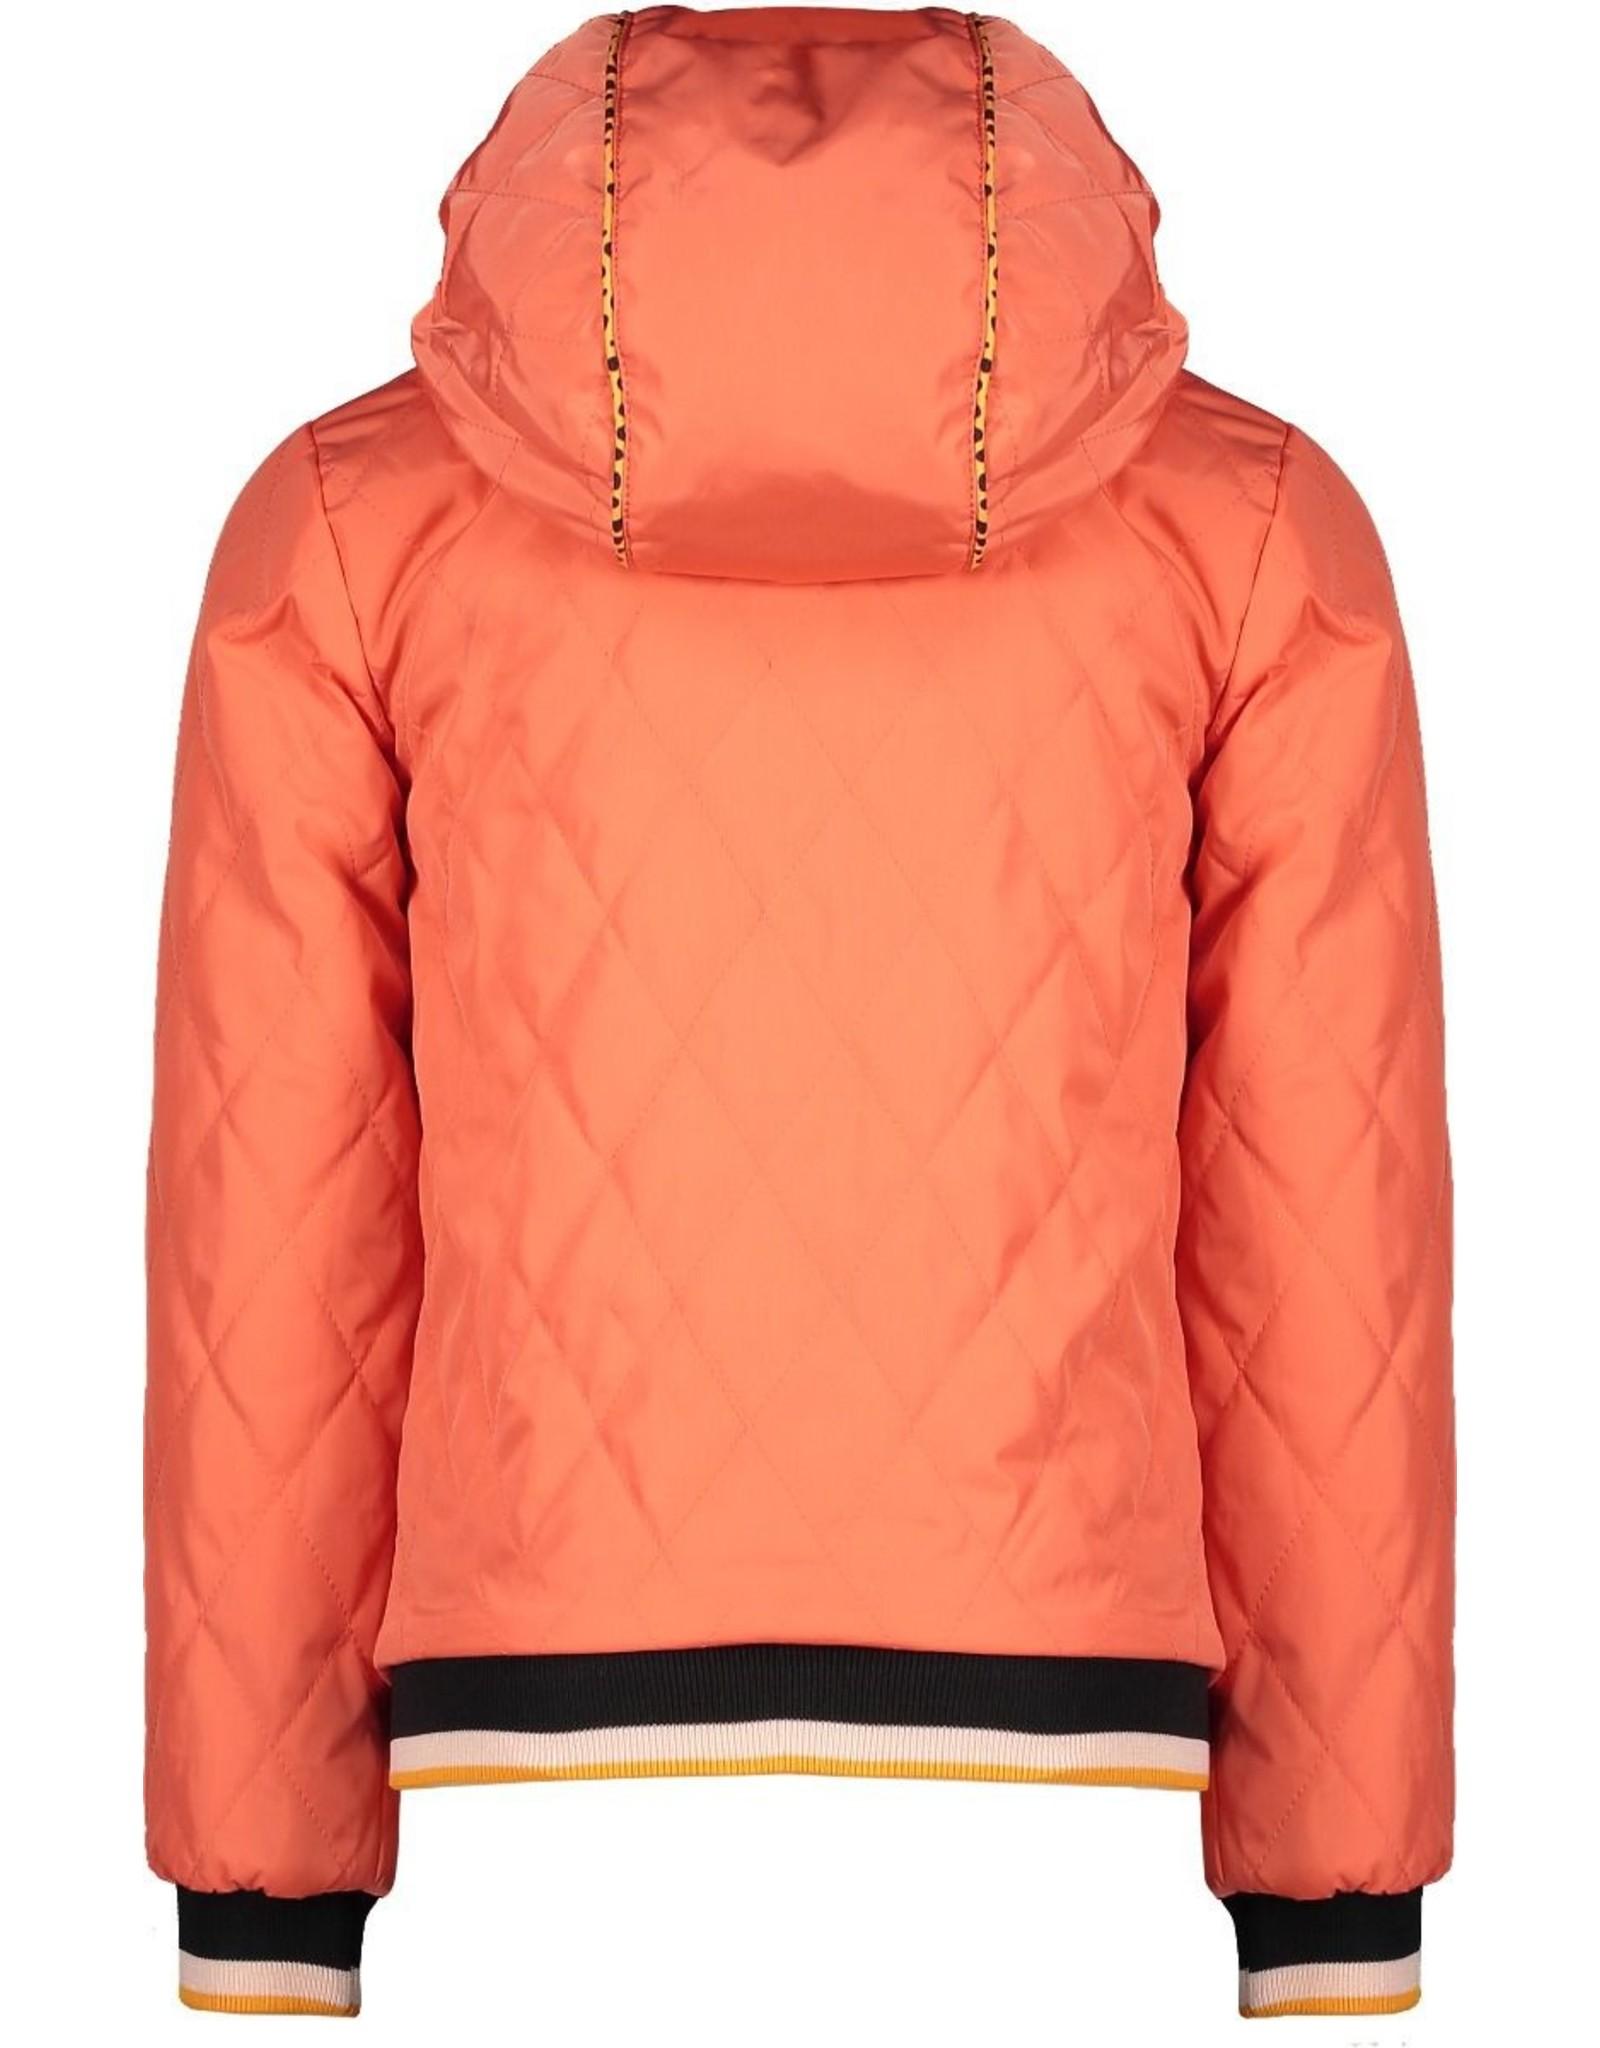 NONO NoNo Recycled Jacket Rev. Blazing Orange